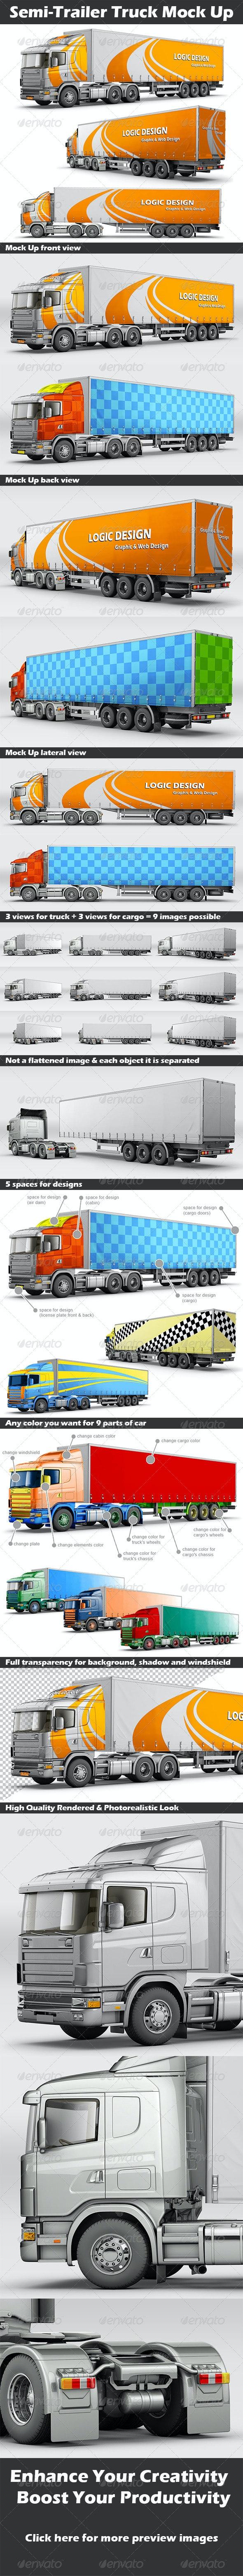 Semi-Trailer Truck Mock Up - Product Mock-Ups Graphics